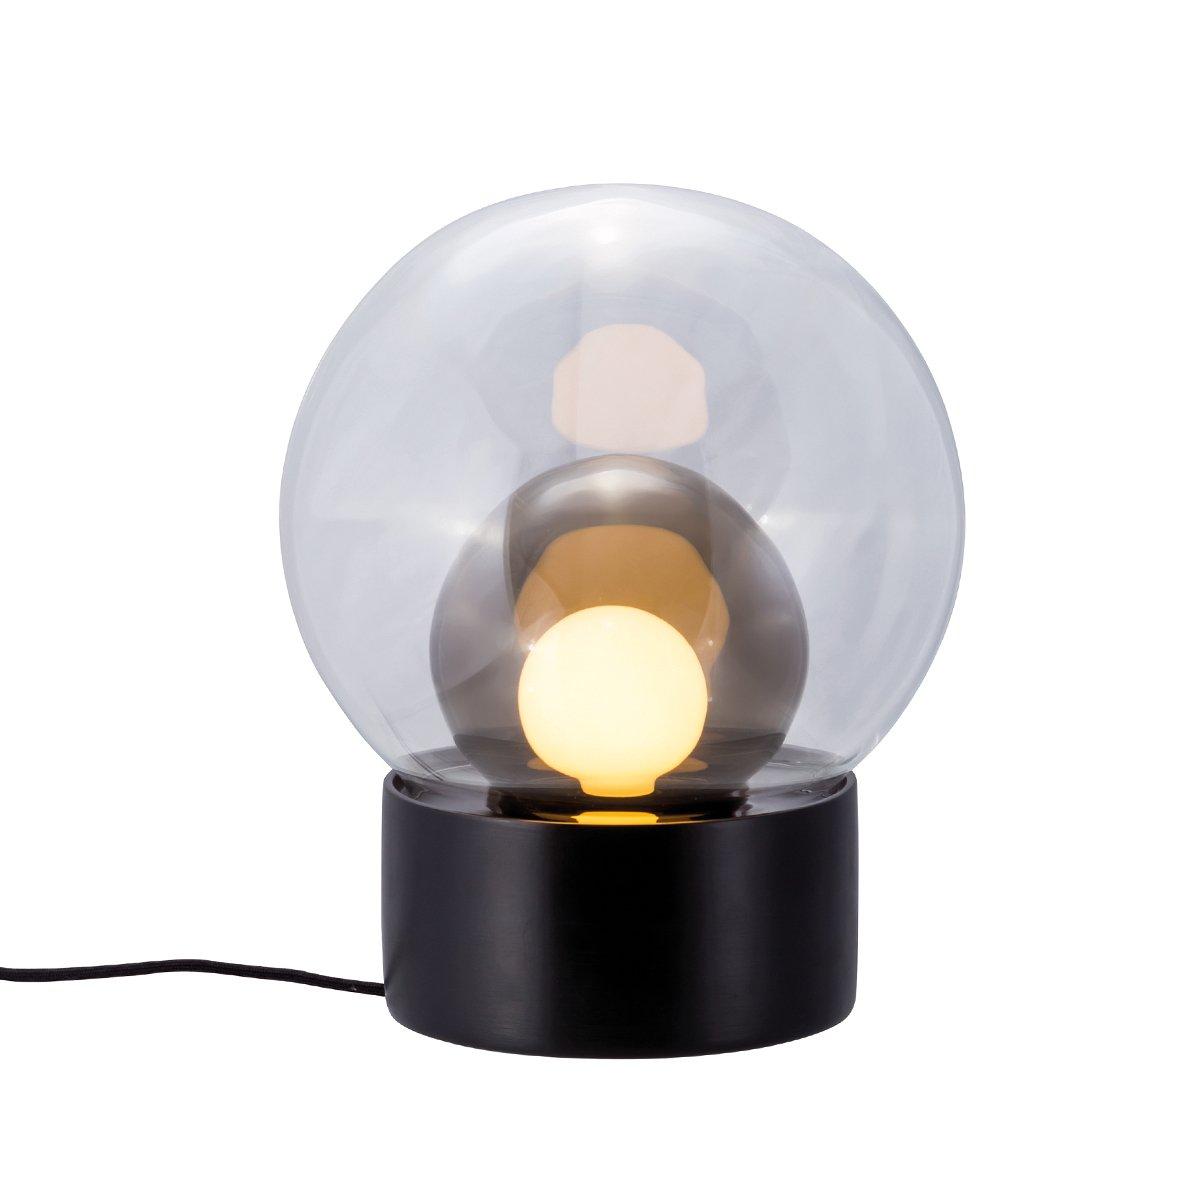 Pulpo Boule Tafellamp Sebastian Herkner (2016) - Zwart - Transparant - Smoke Grey